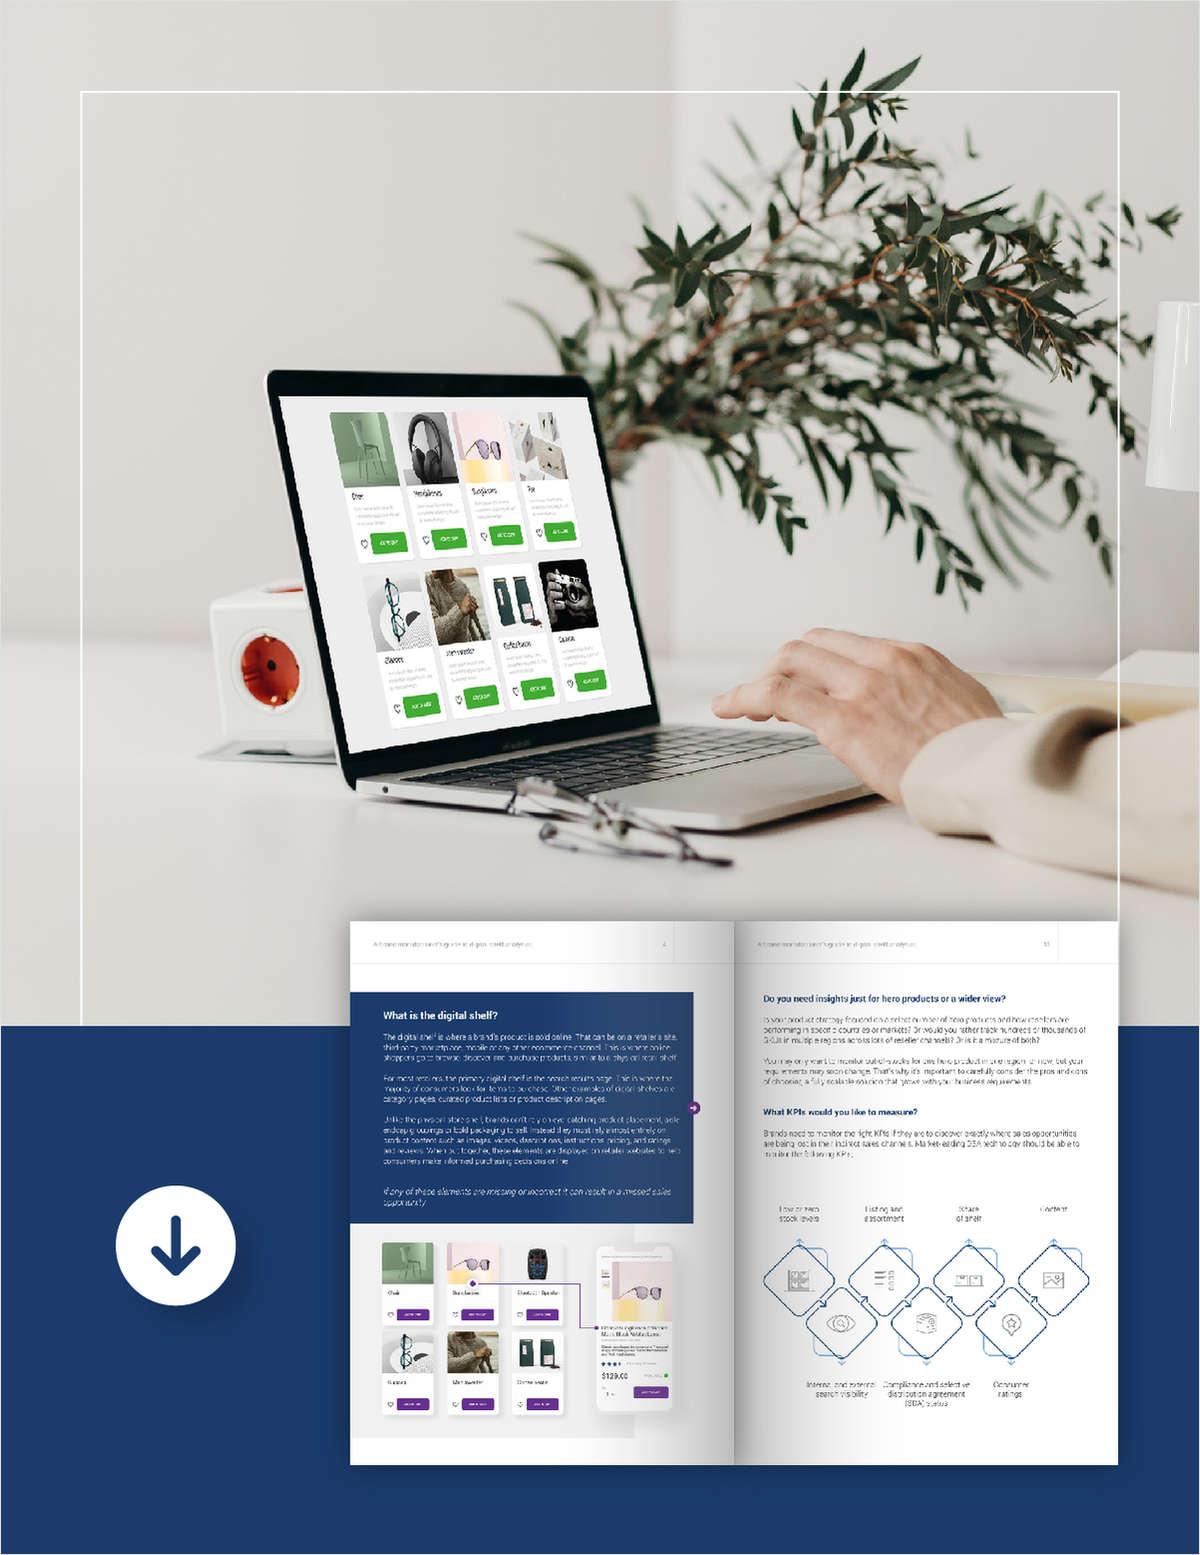 A brand manufacturer's guide to digital shelf analytics